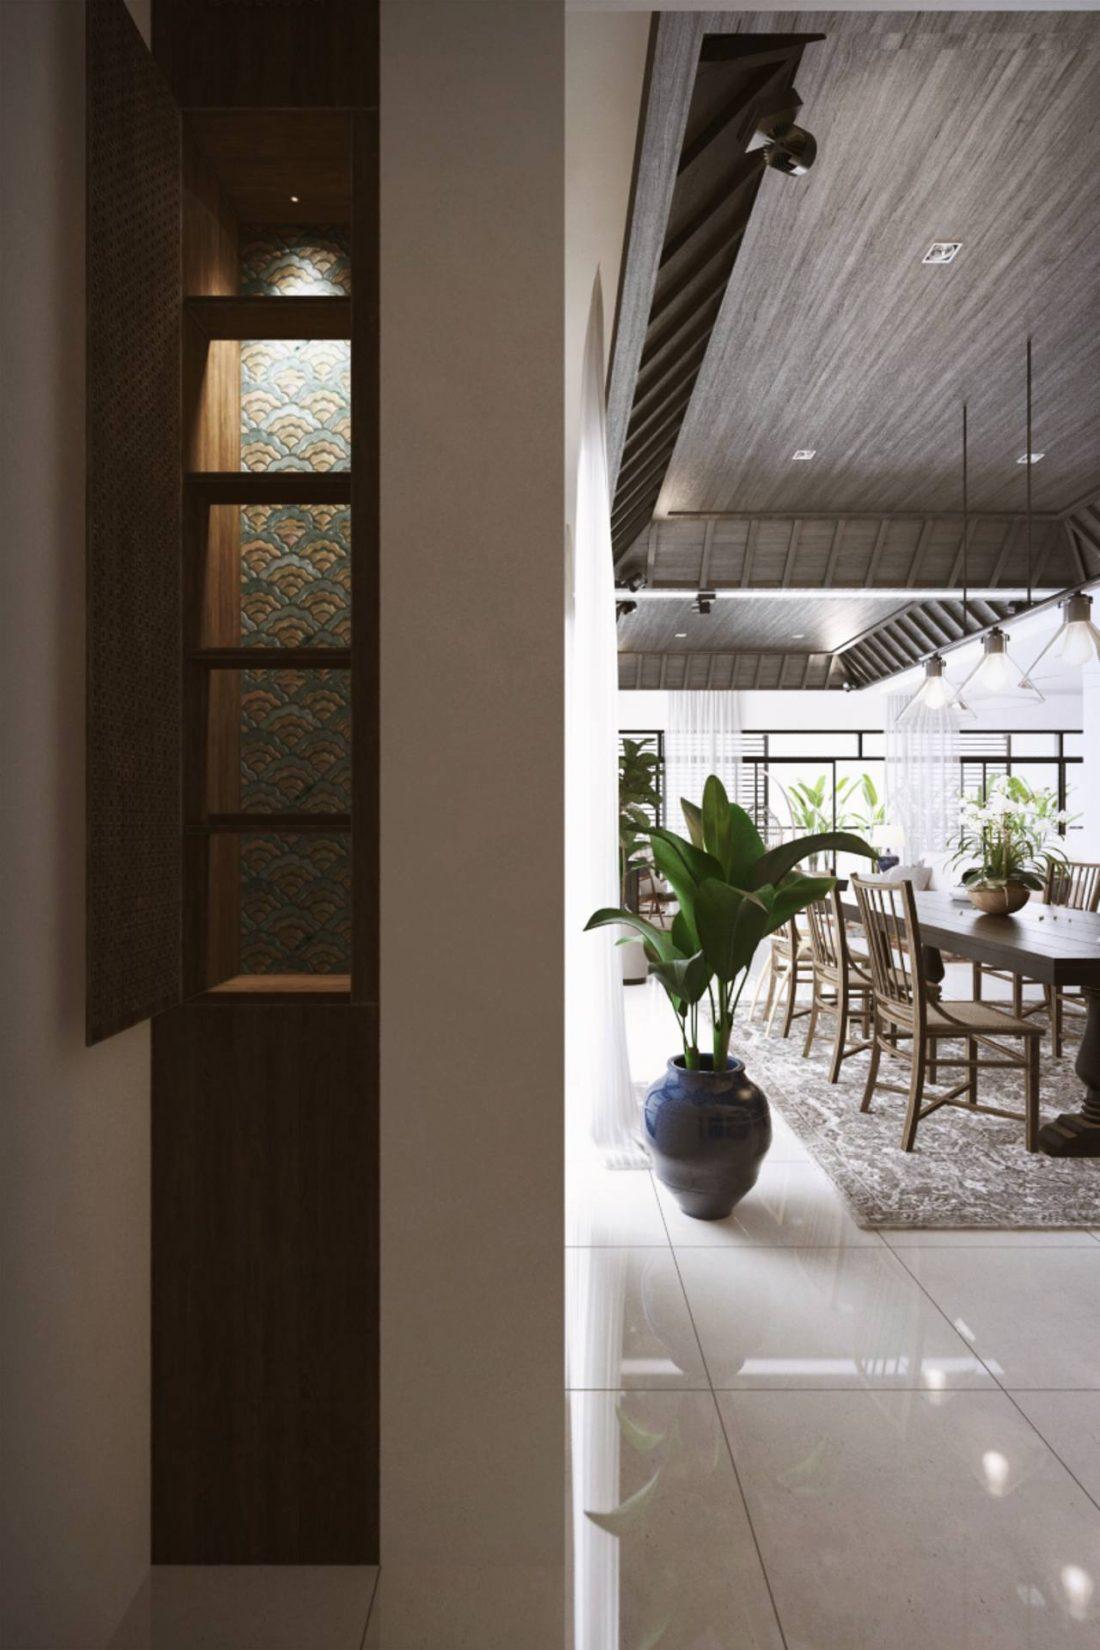 Interior Design The Light Collection III Penang Malaysia Foyer Design v2